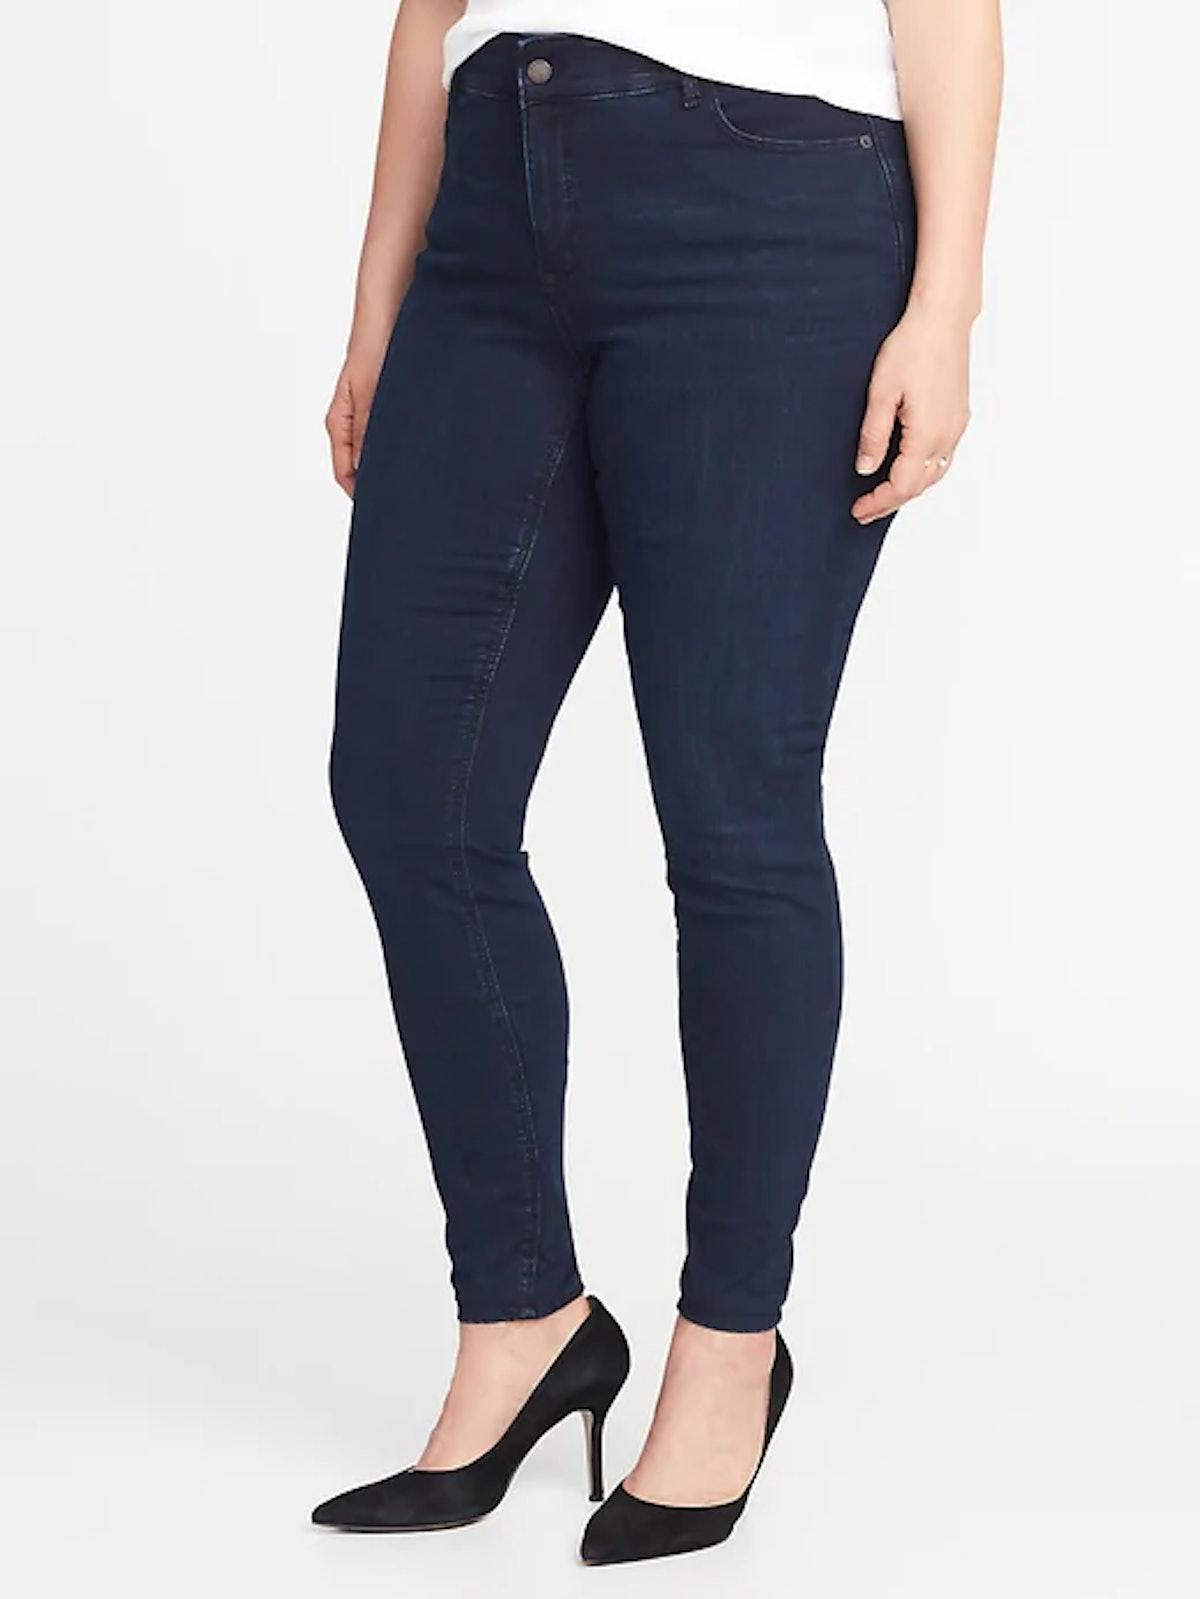 High-Rise Secret-Slim Pockets + Waistband Plus-Size Rockstar Jeans